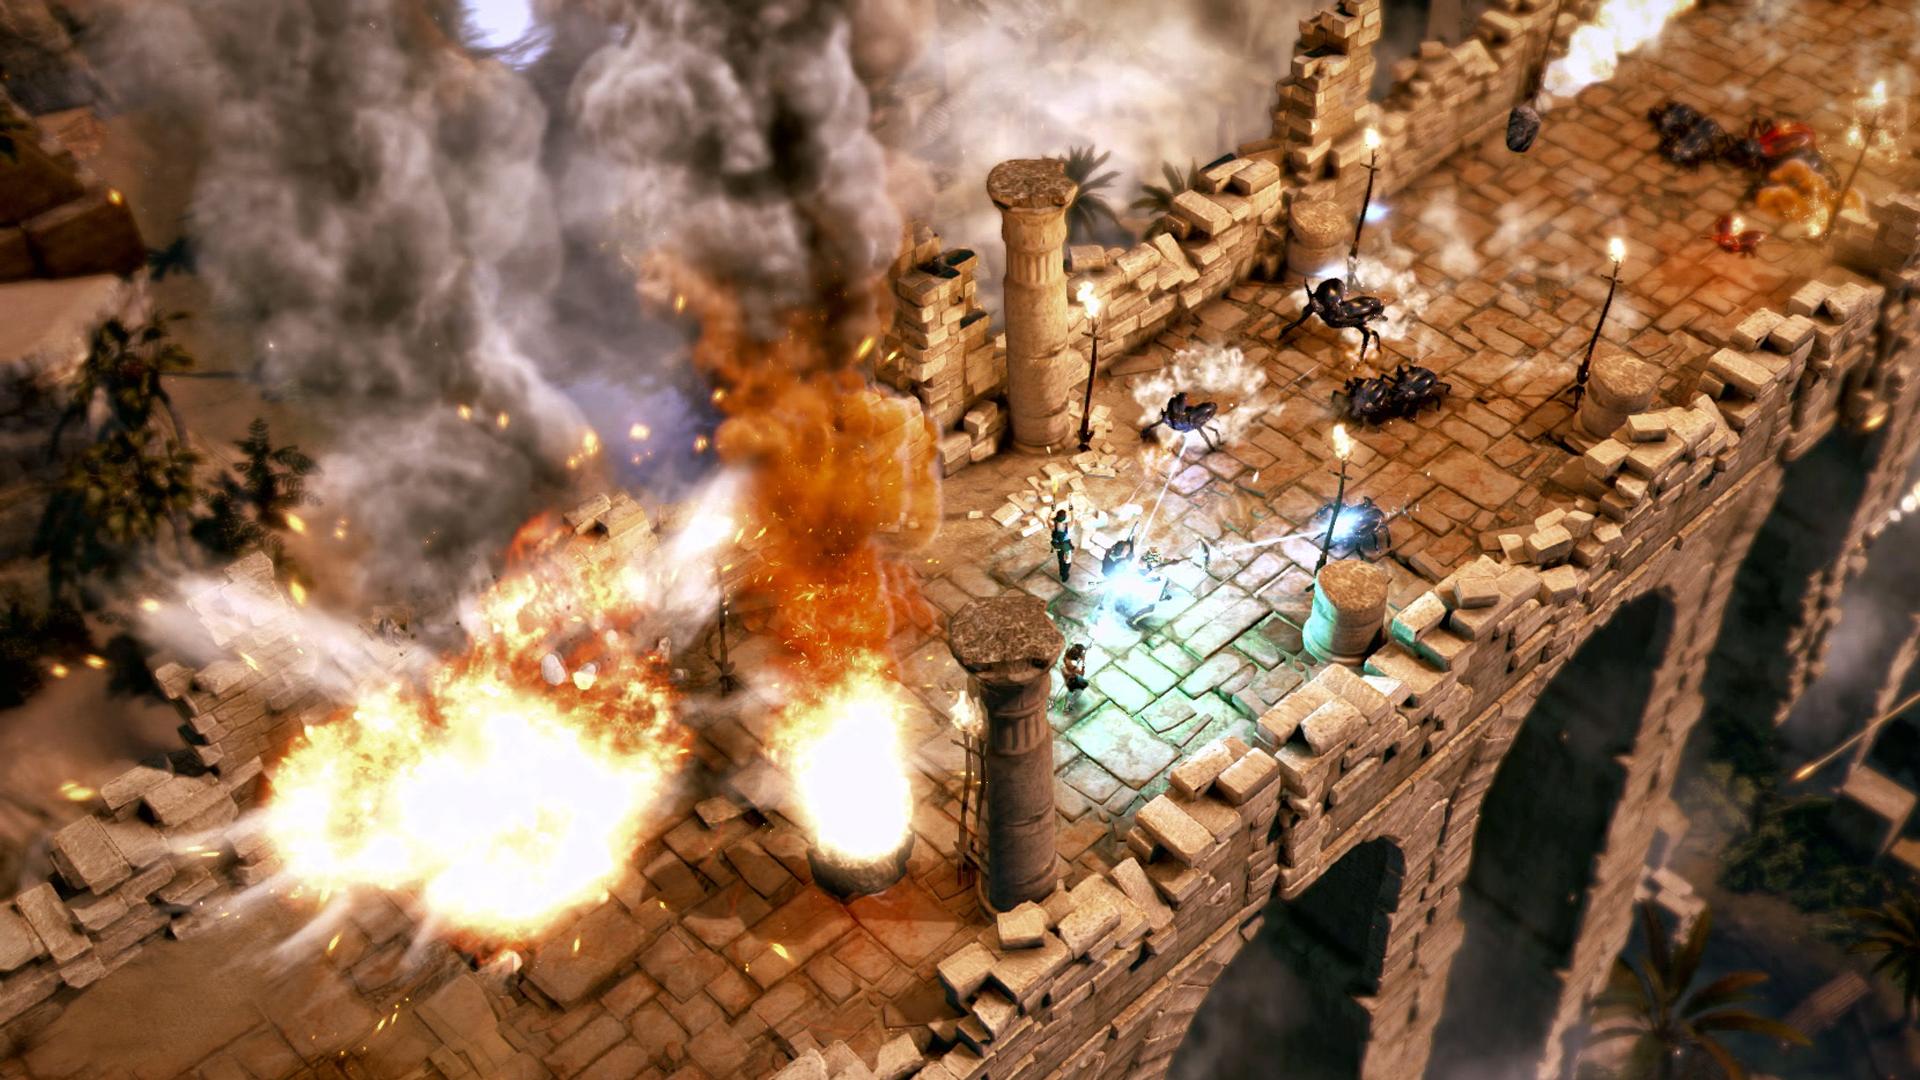 Lara Croft And The Temple Of Osiris ESPAÑOL PC (CODEX) 1